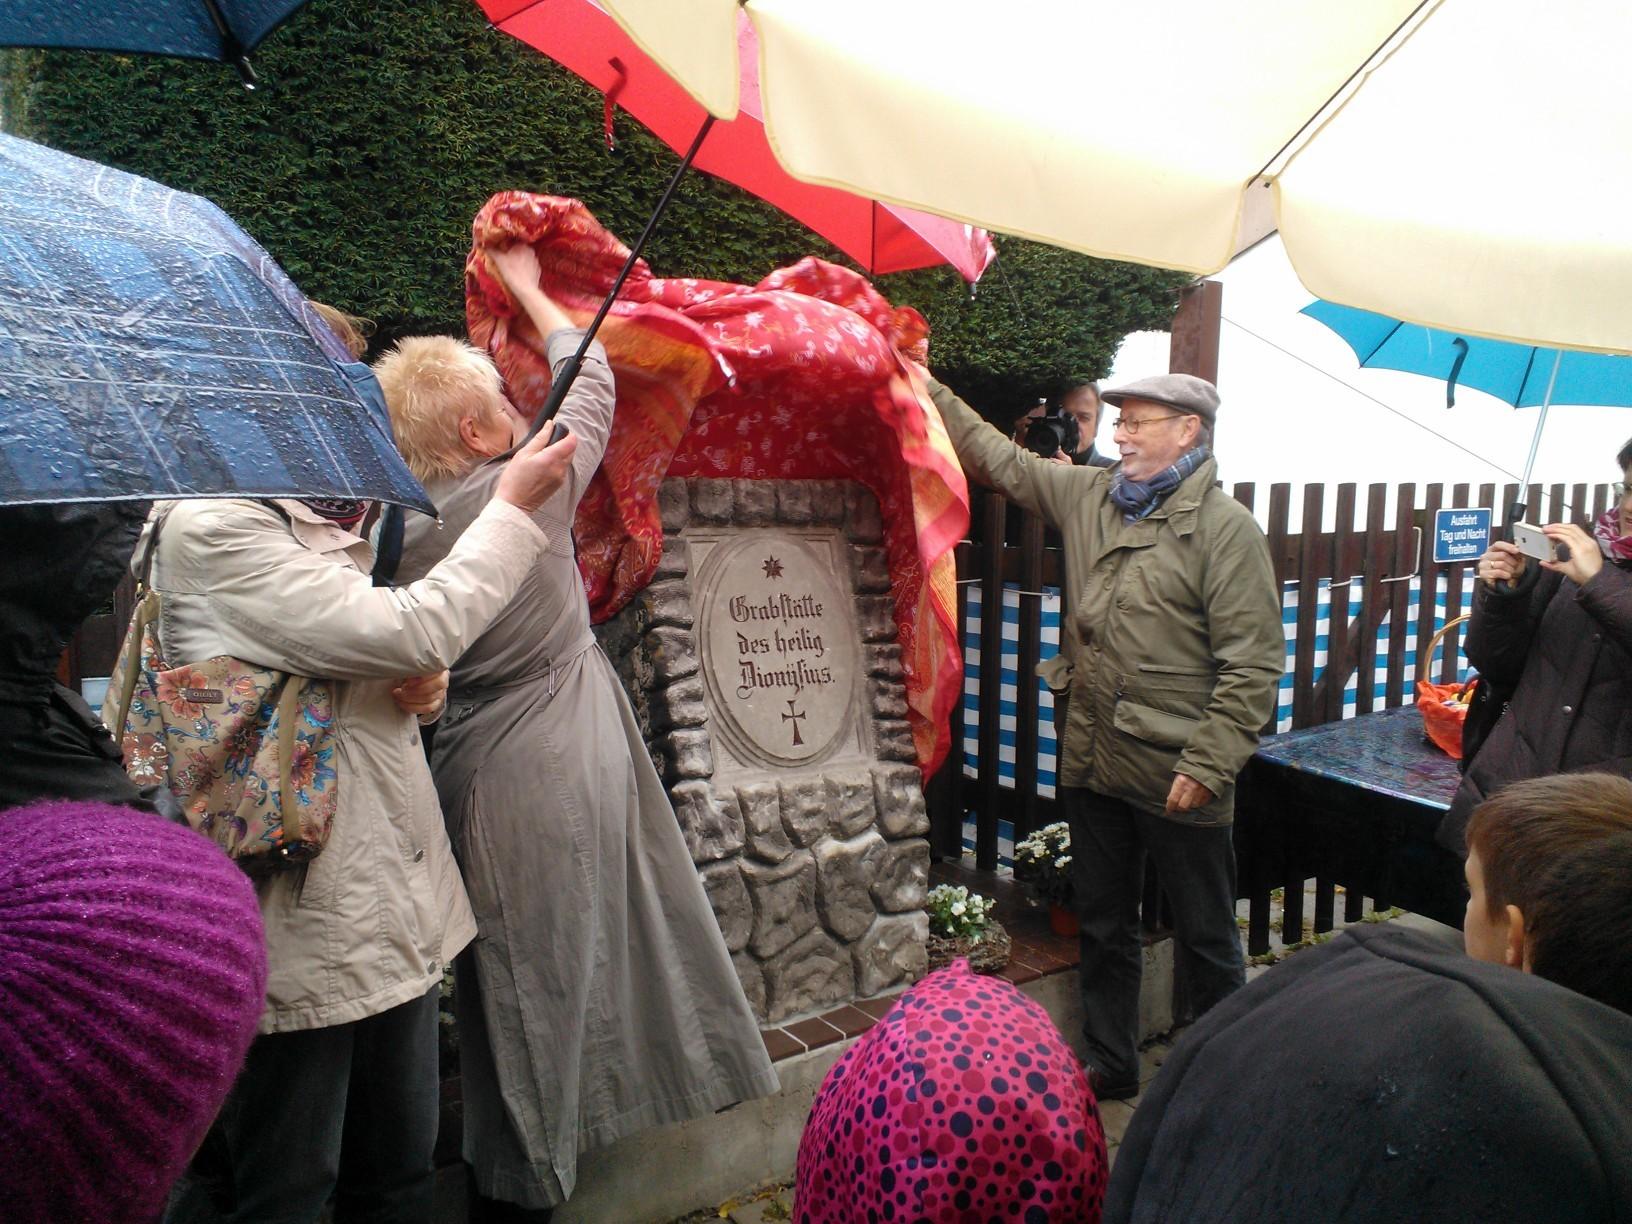 Das Dionysius-Denkmal in neuem Glanz